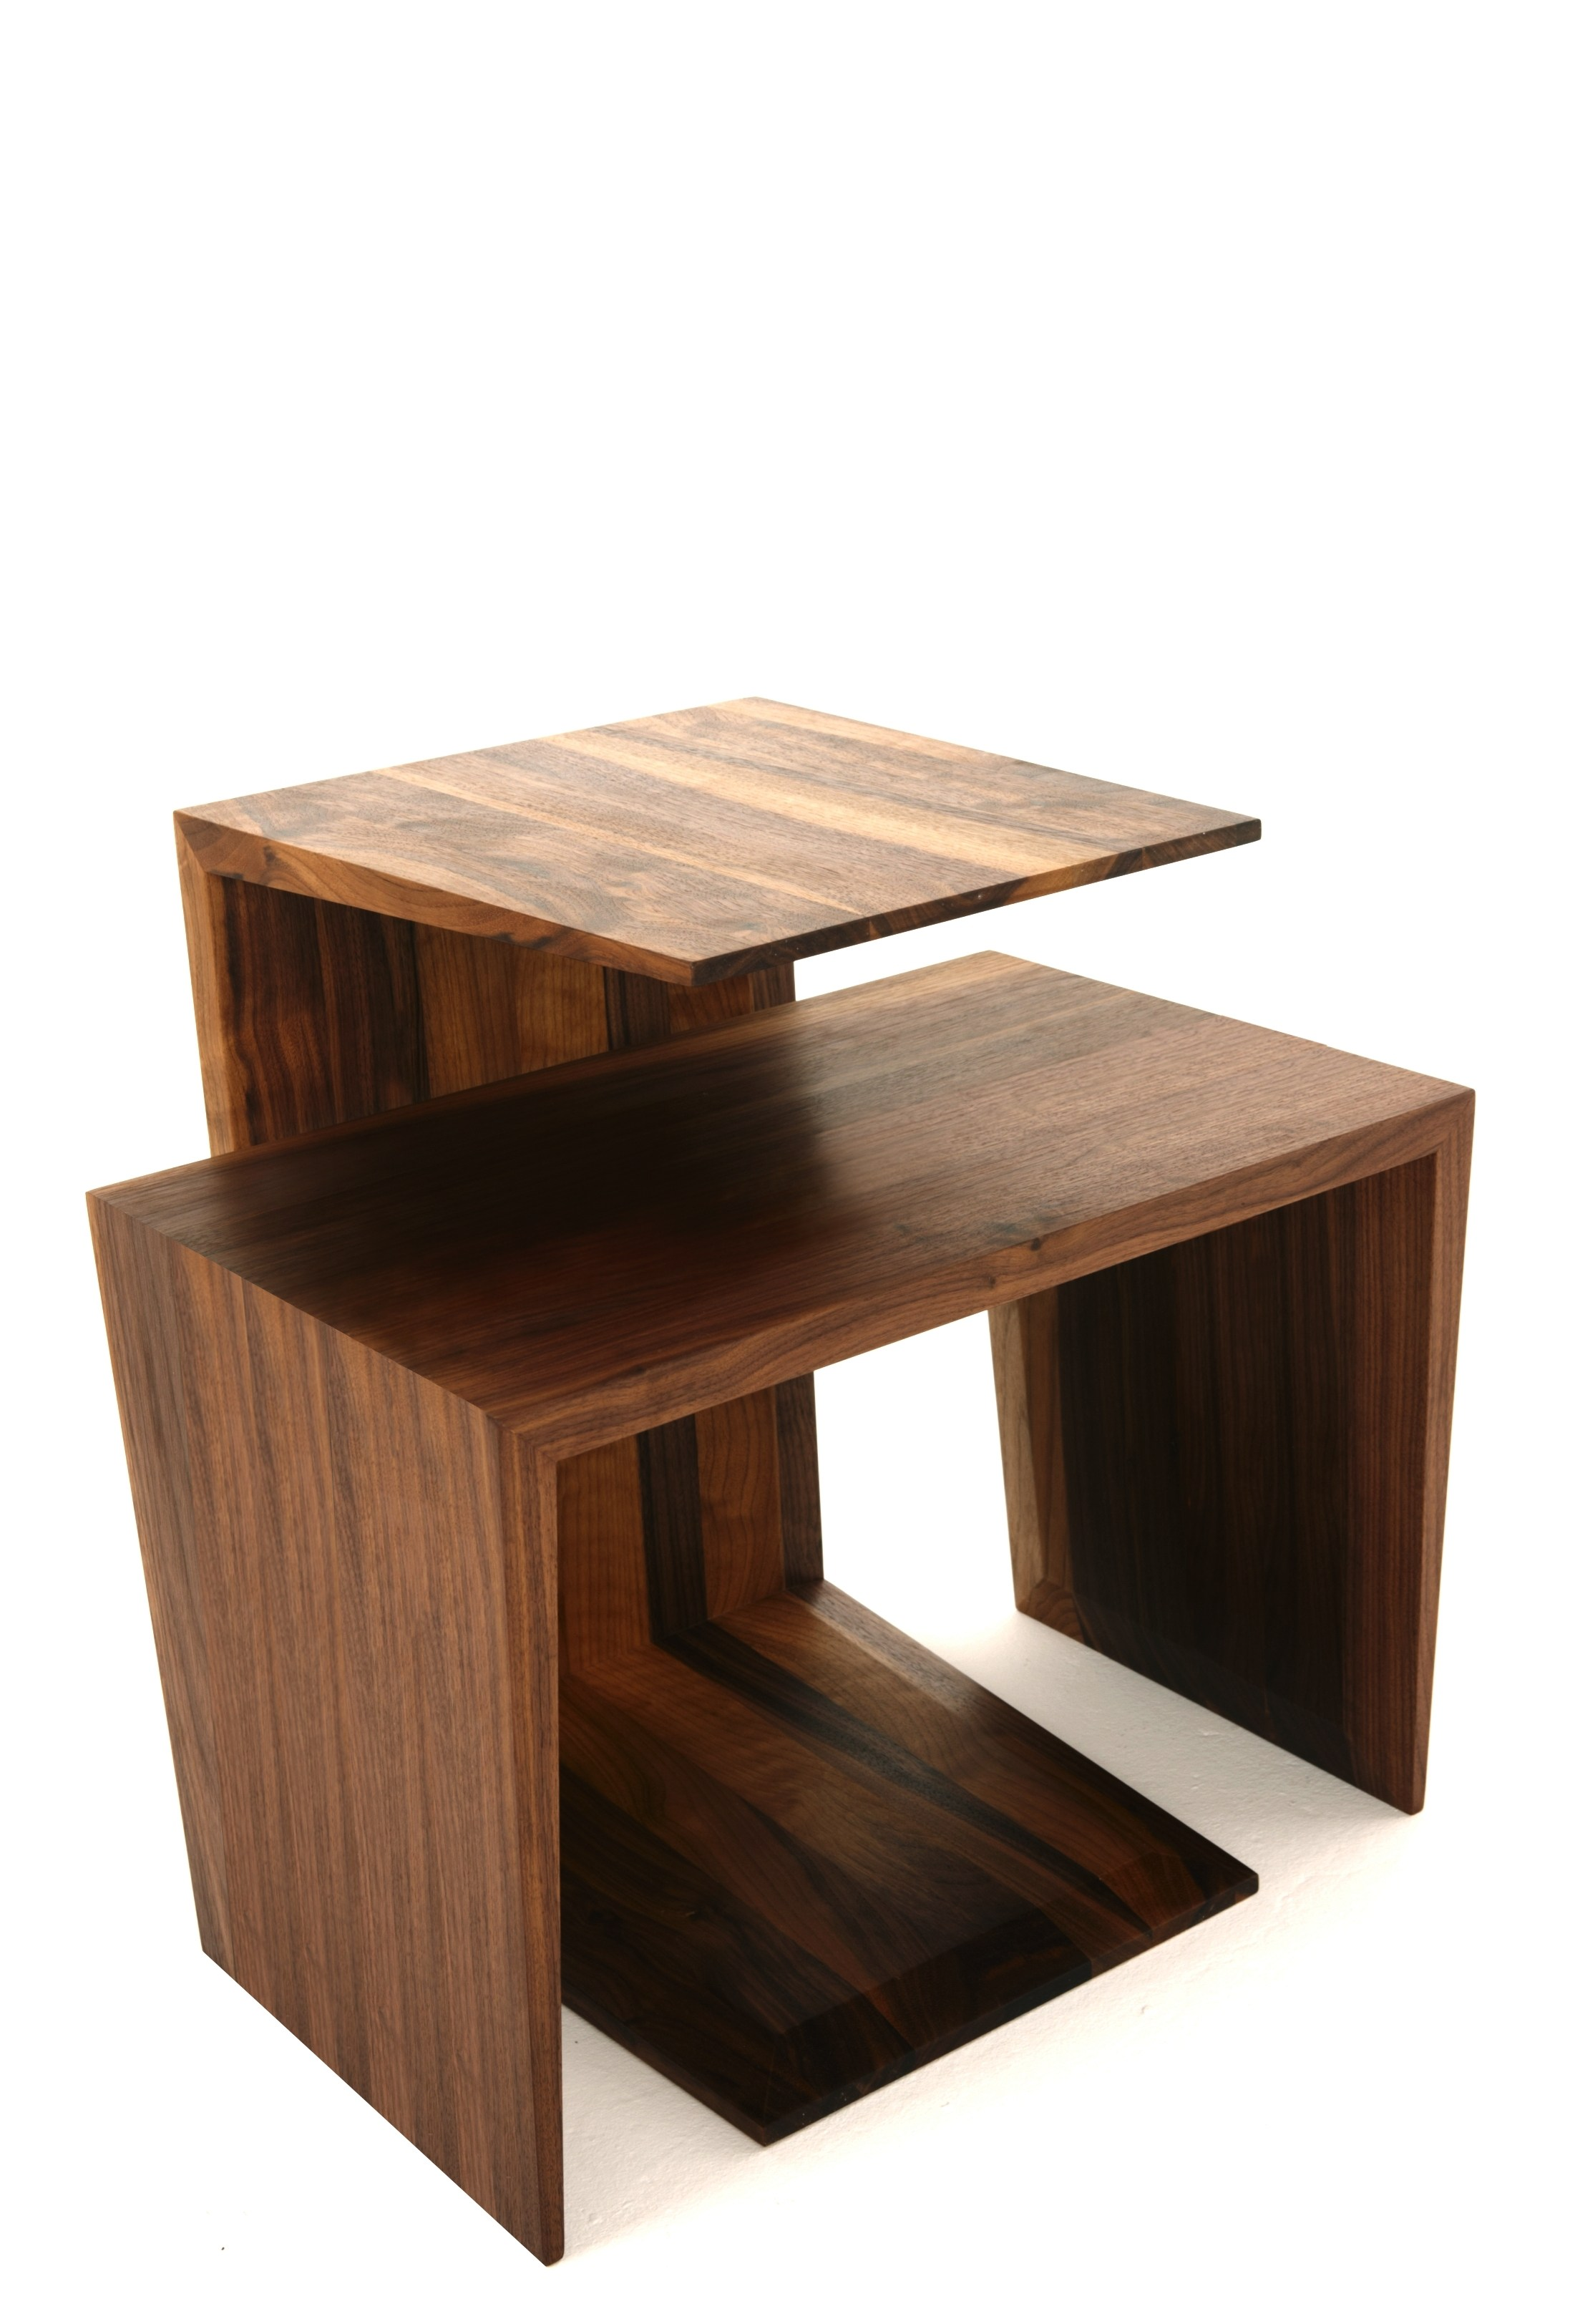 Table basse rectangulaire en noyer de salon monarch by dare studio design sean dare - Table de salon rectangulaire ...